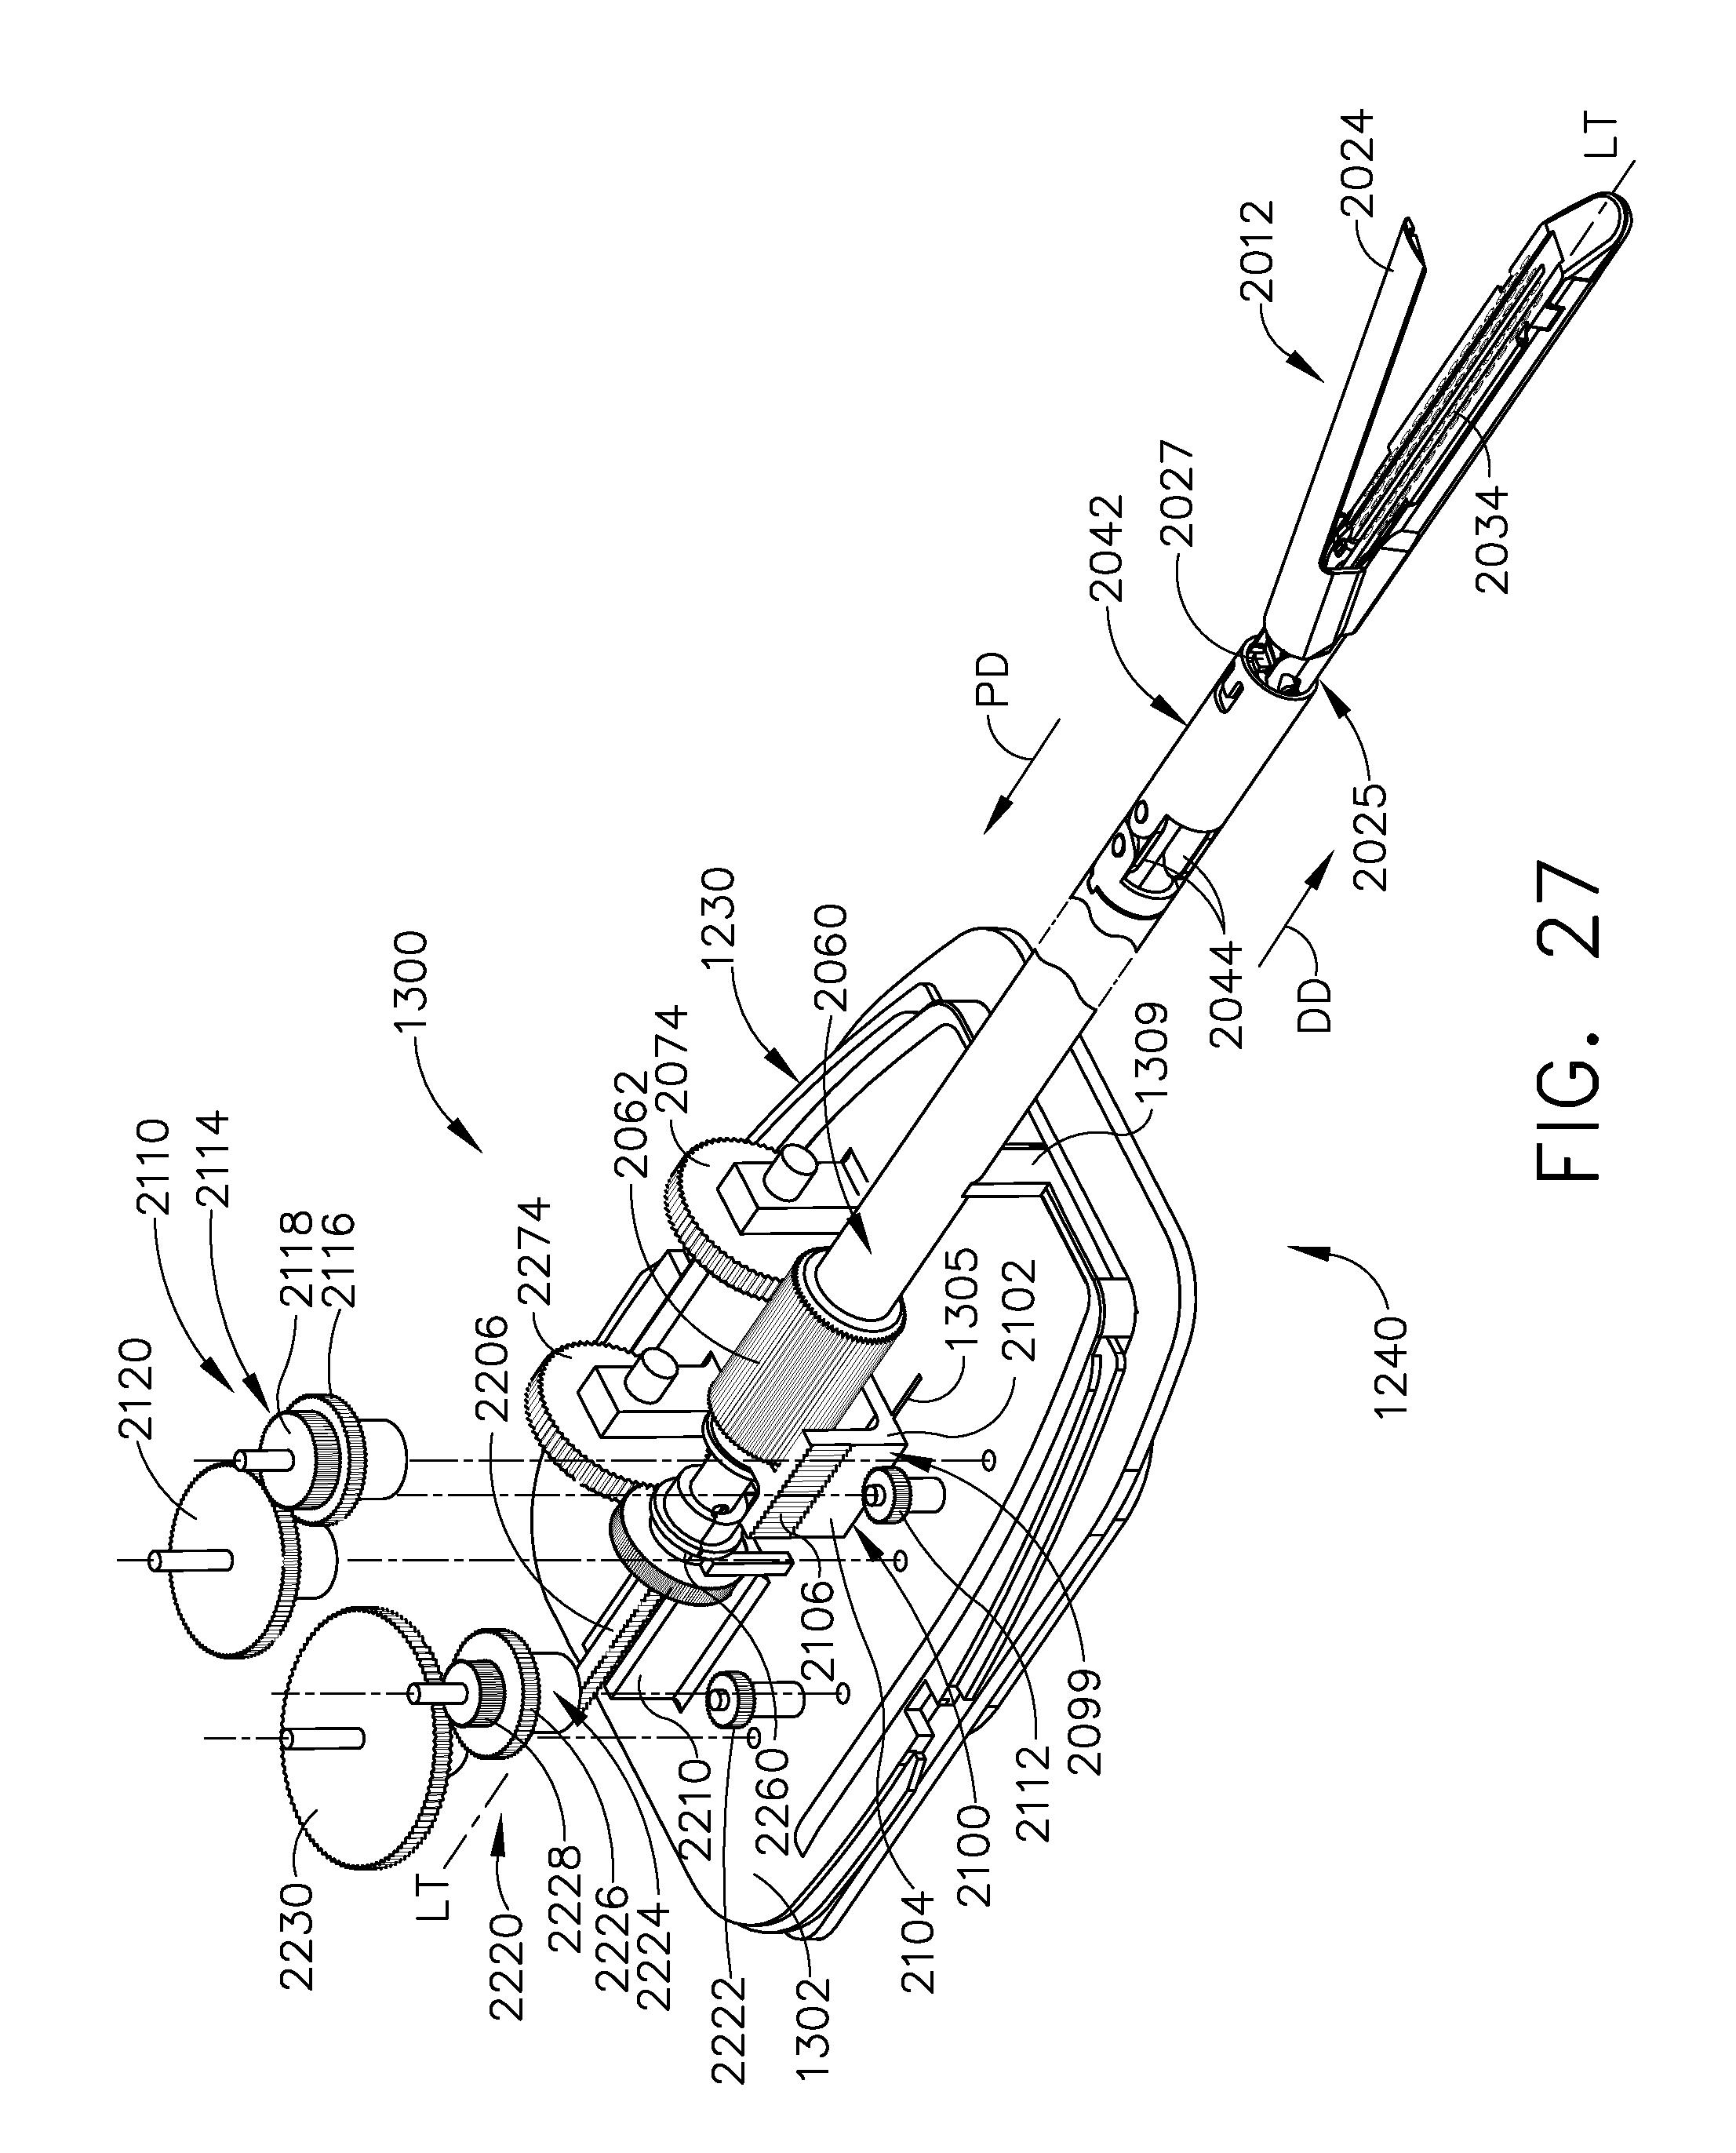 2301 honda h engine diagram us8573465b2 robotically controlled surgical end effector system  robotically controlled surgical end